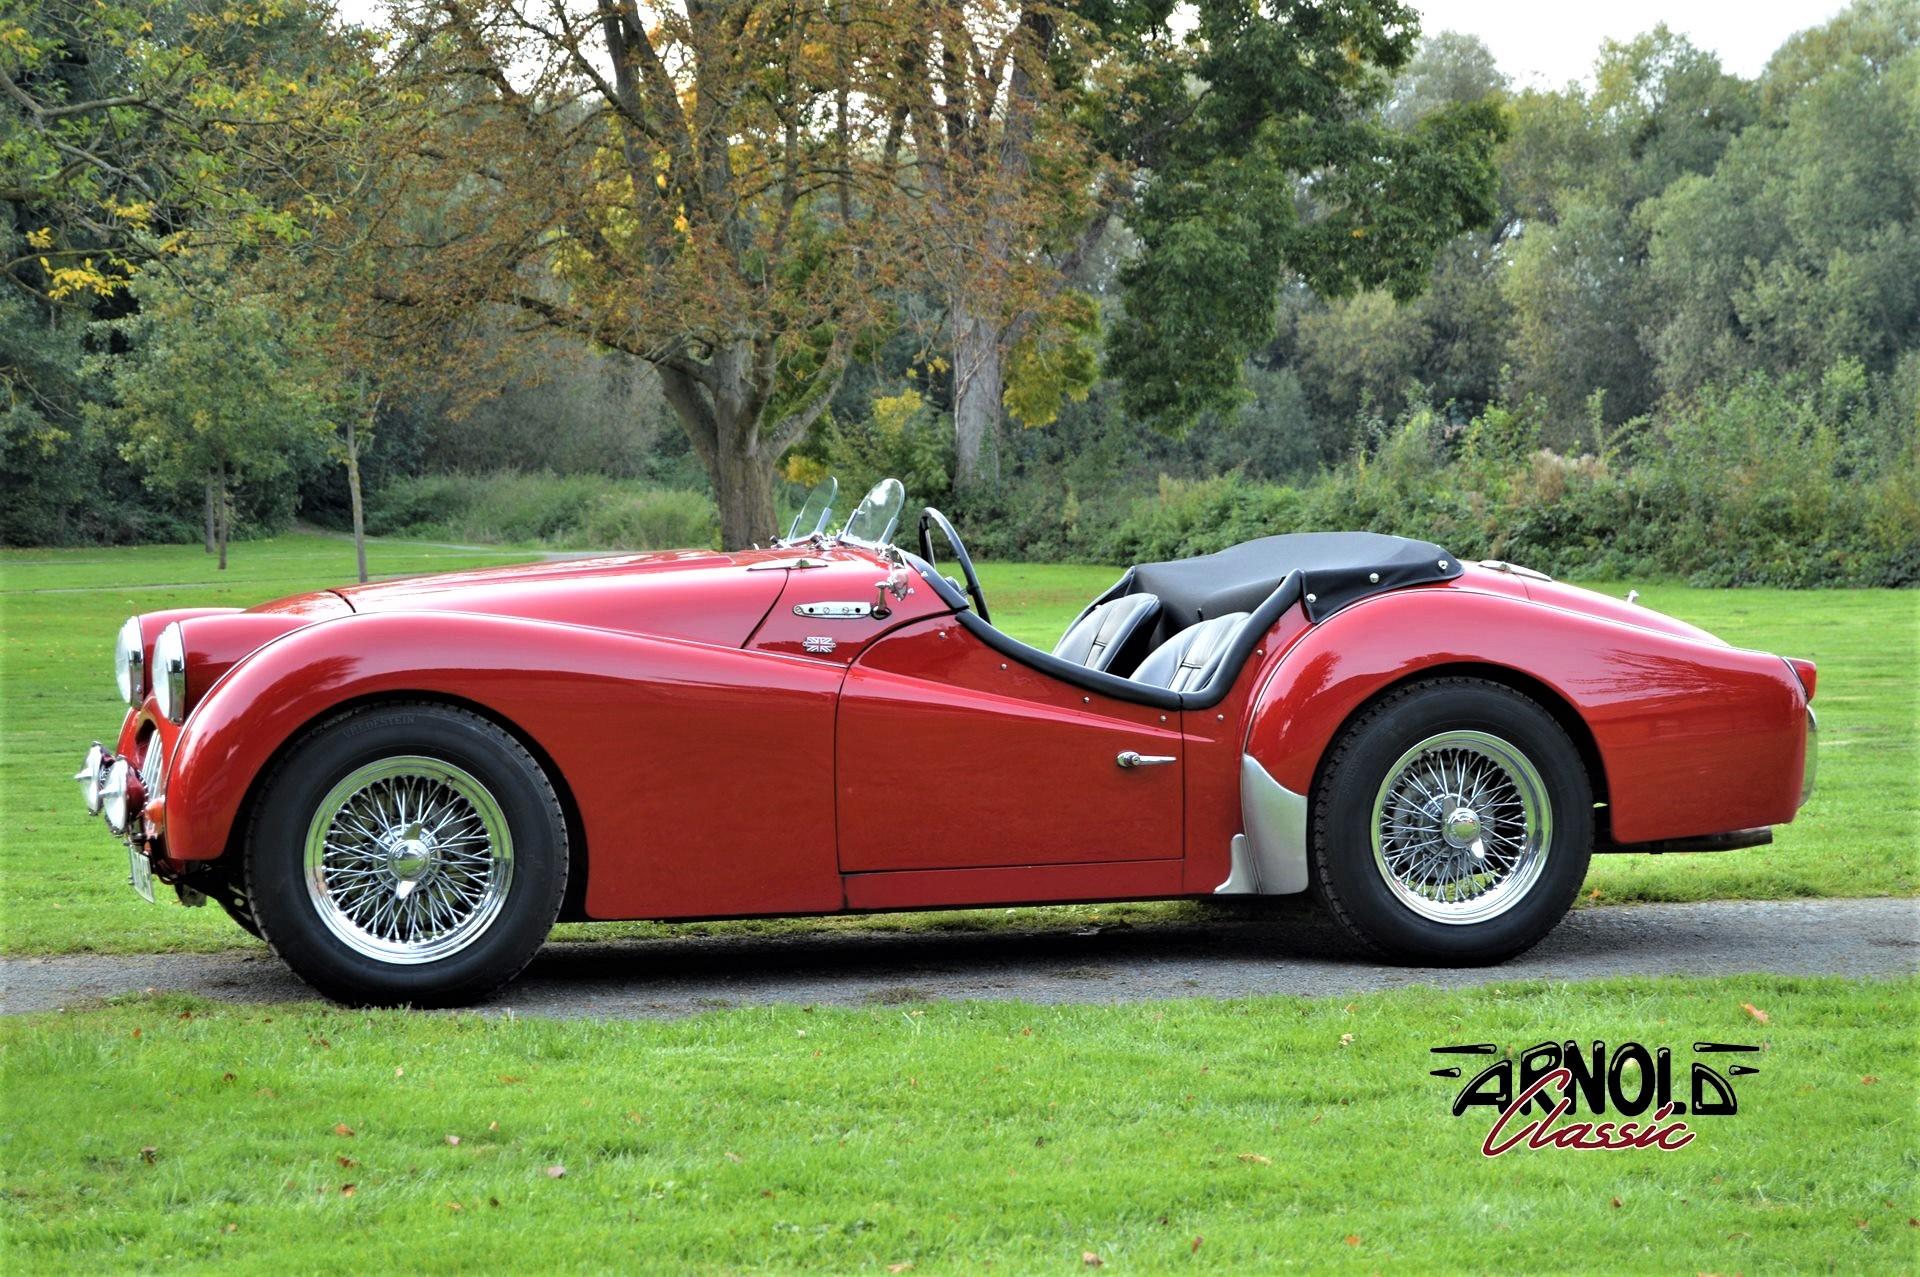 Triumph TR3 1957 rot Arnold Classic Oldtimer Lauenau